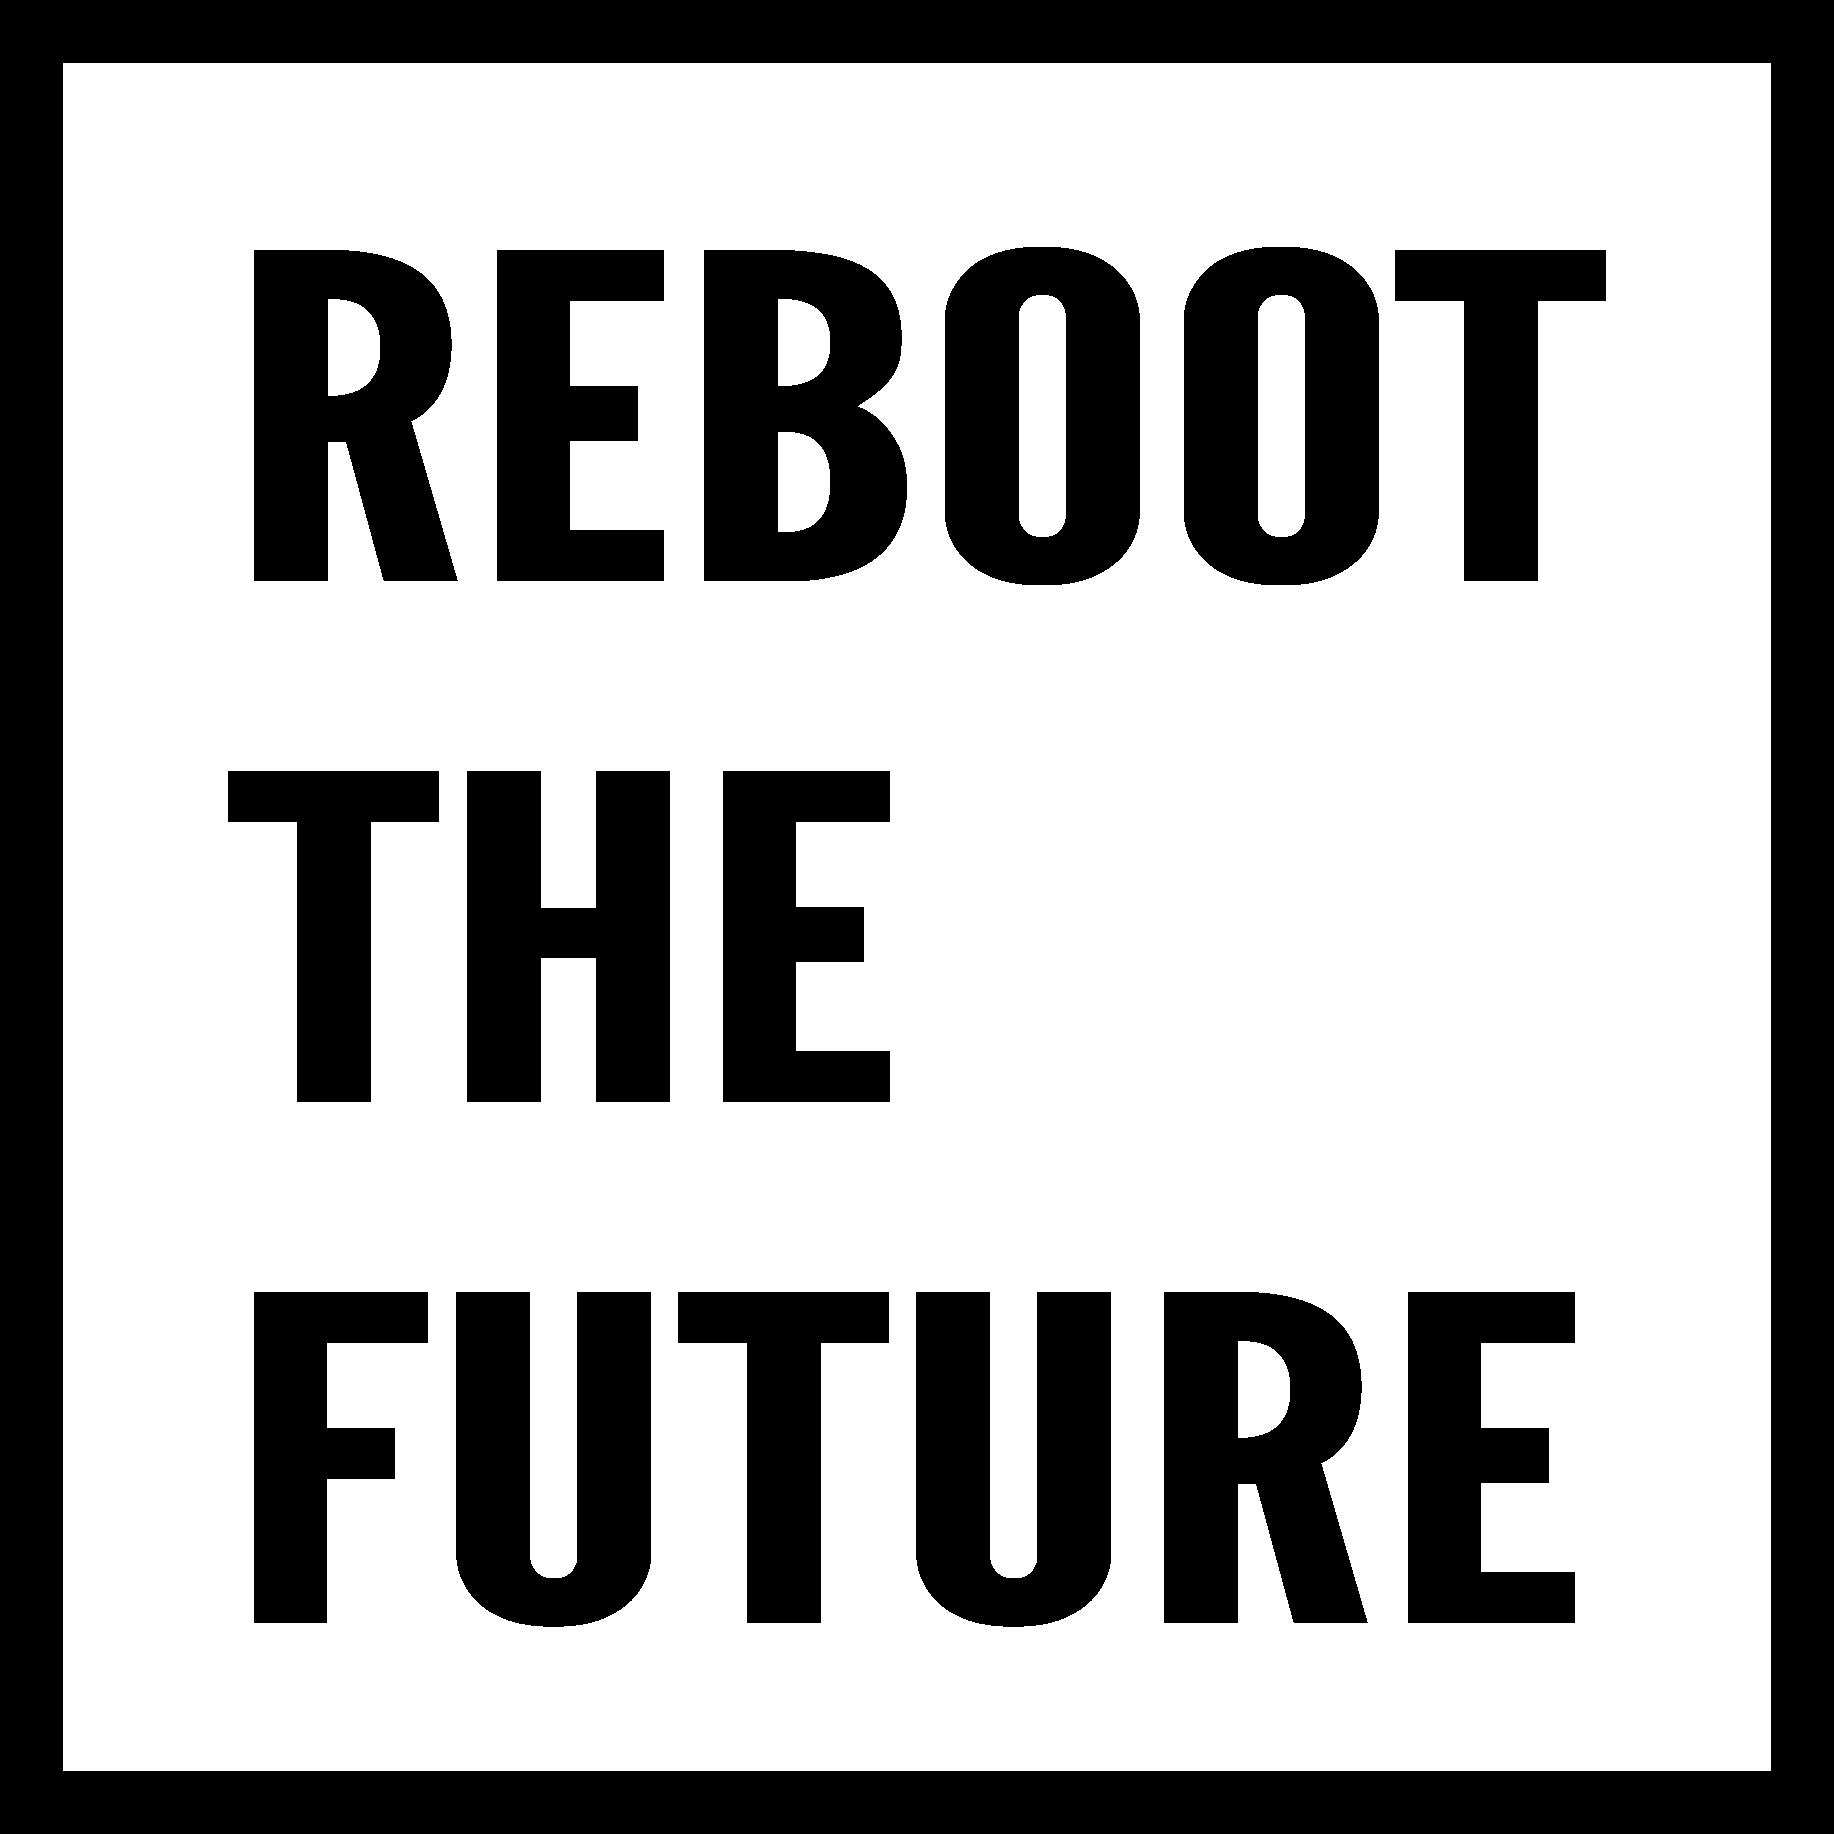 Reboot logo1.png